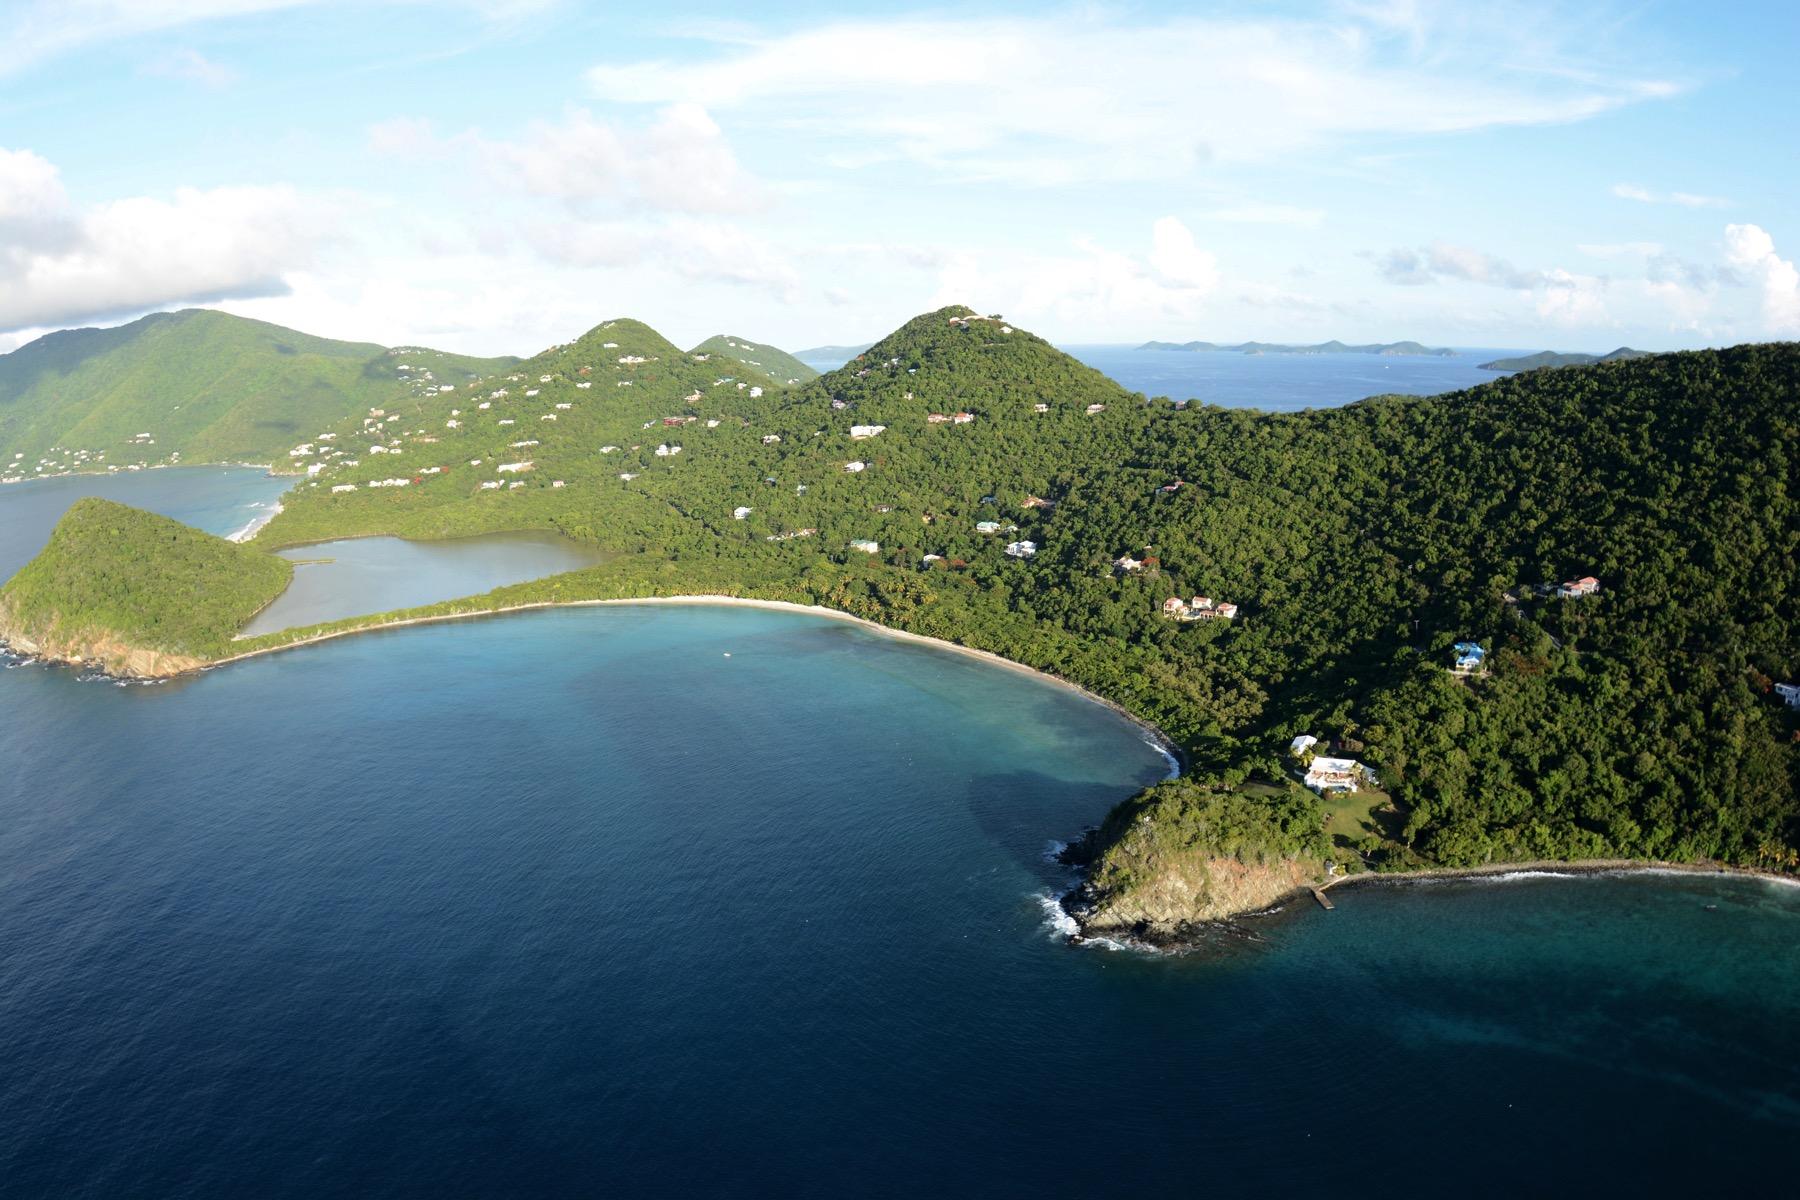 Terreno para Venda às Belmont Beach View Land 328 Belmont, Tortola Ilhas Virgens Britânicas